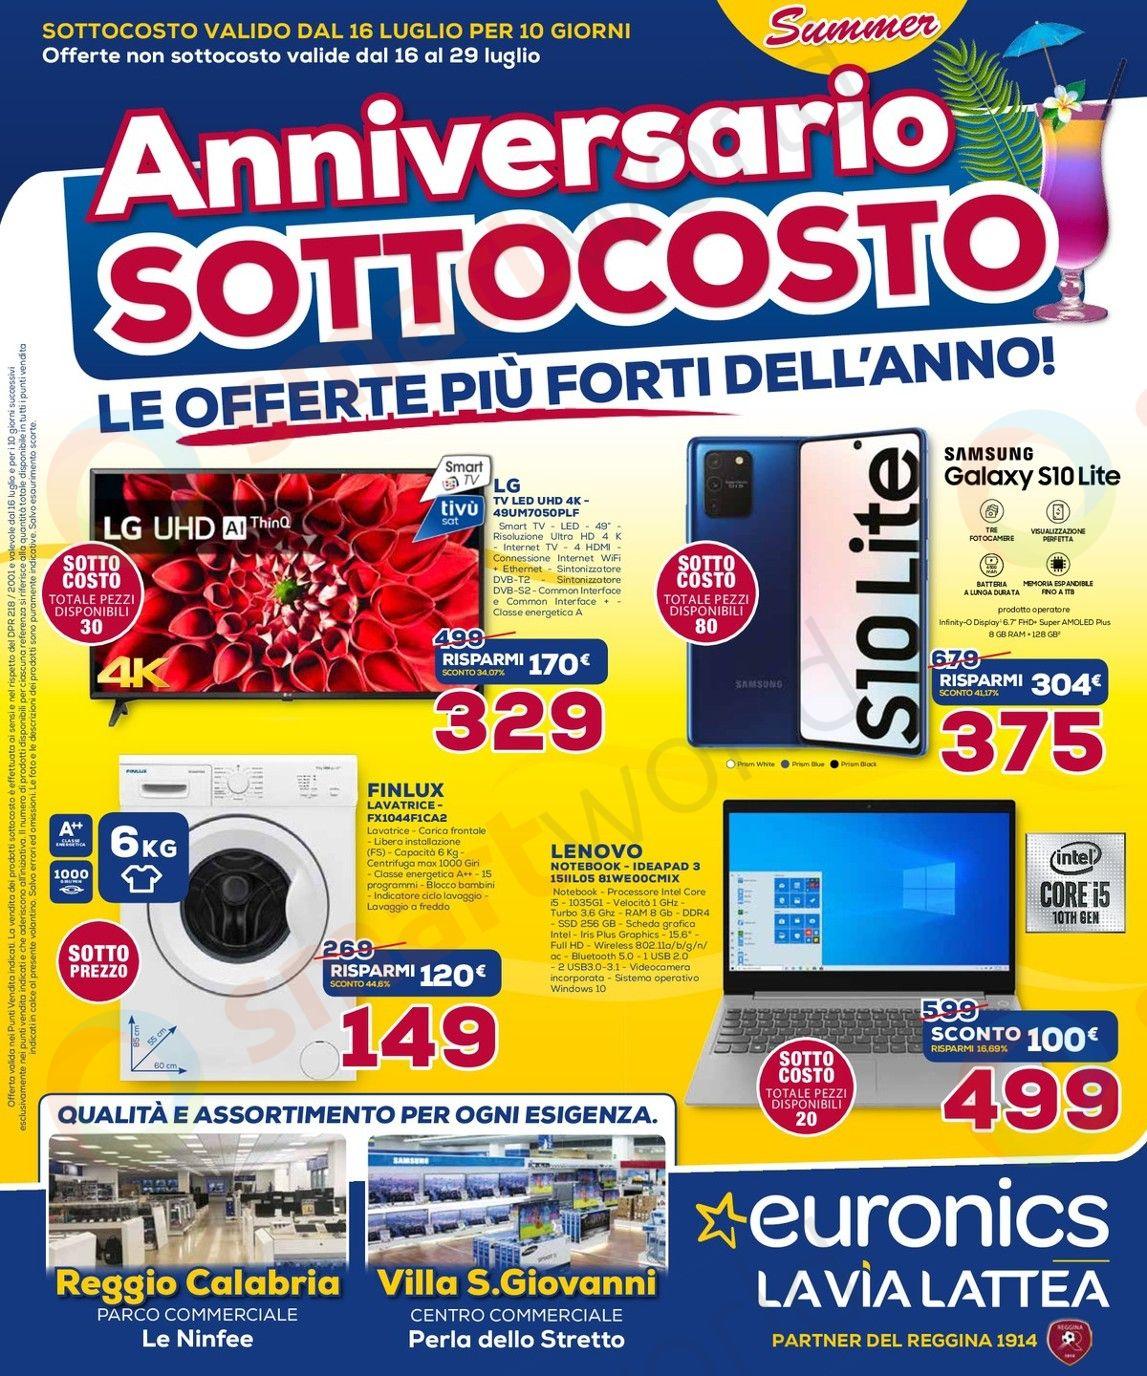 volantino euronics via lattea 2 16-29 luglio 2020 (1)